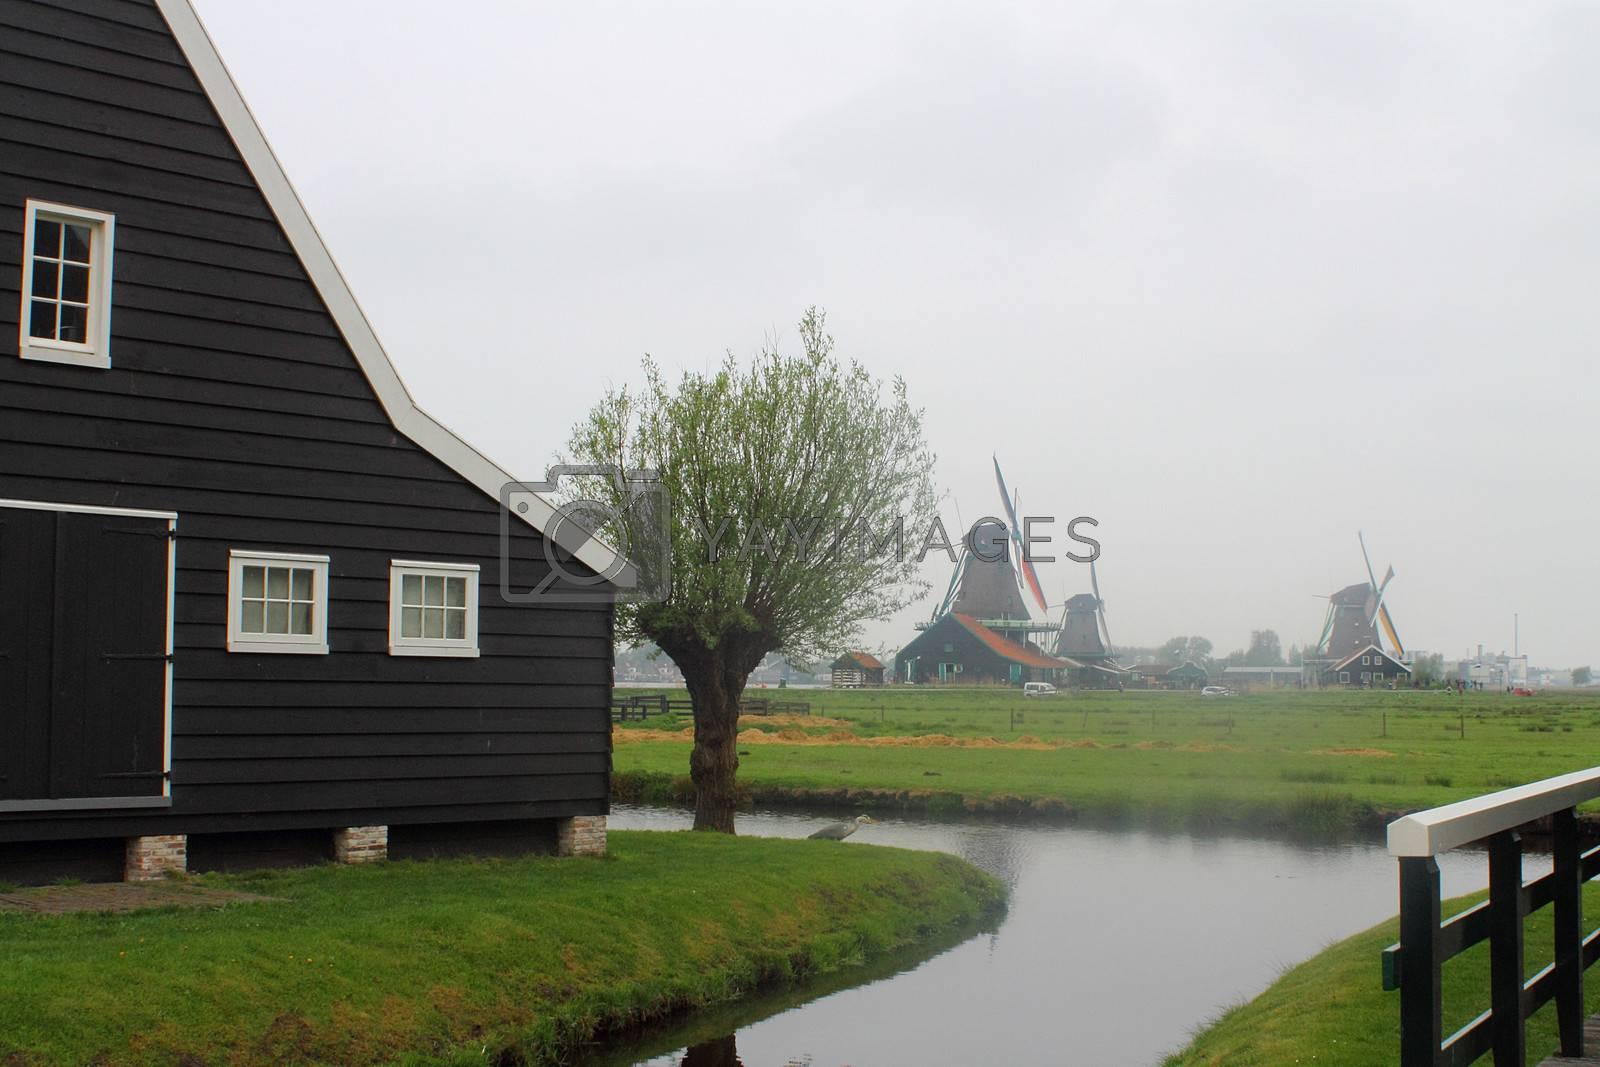 View of Zaanse Schans, Netherlands